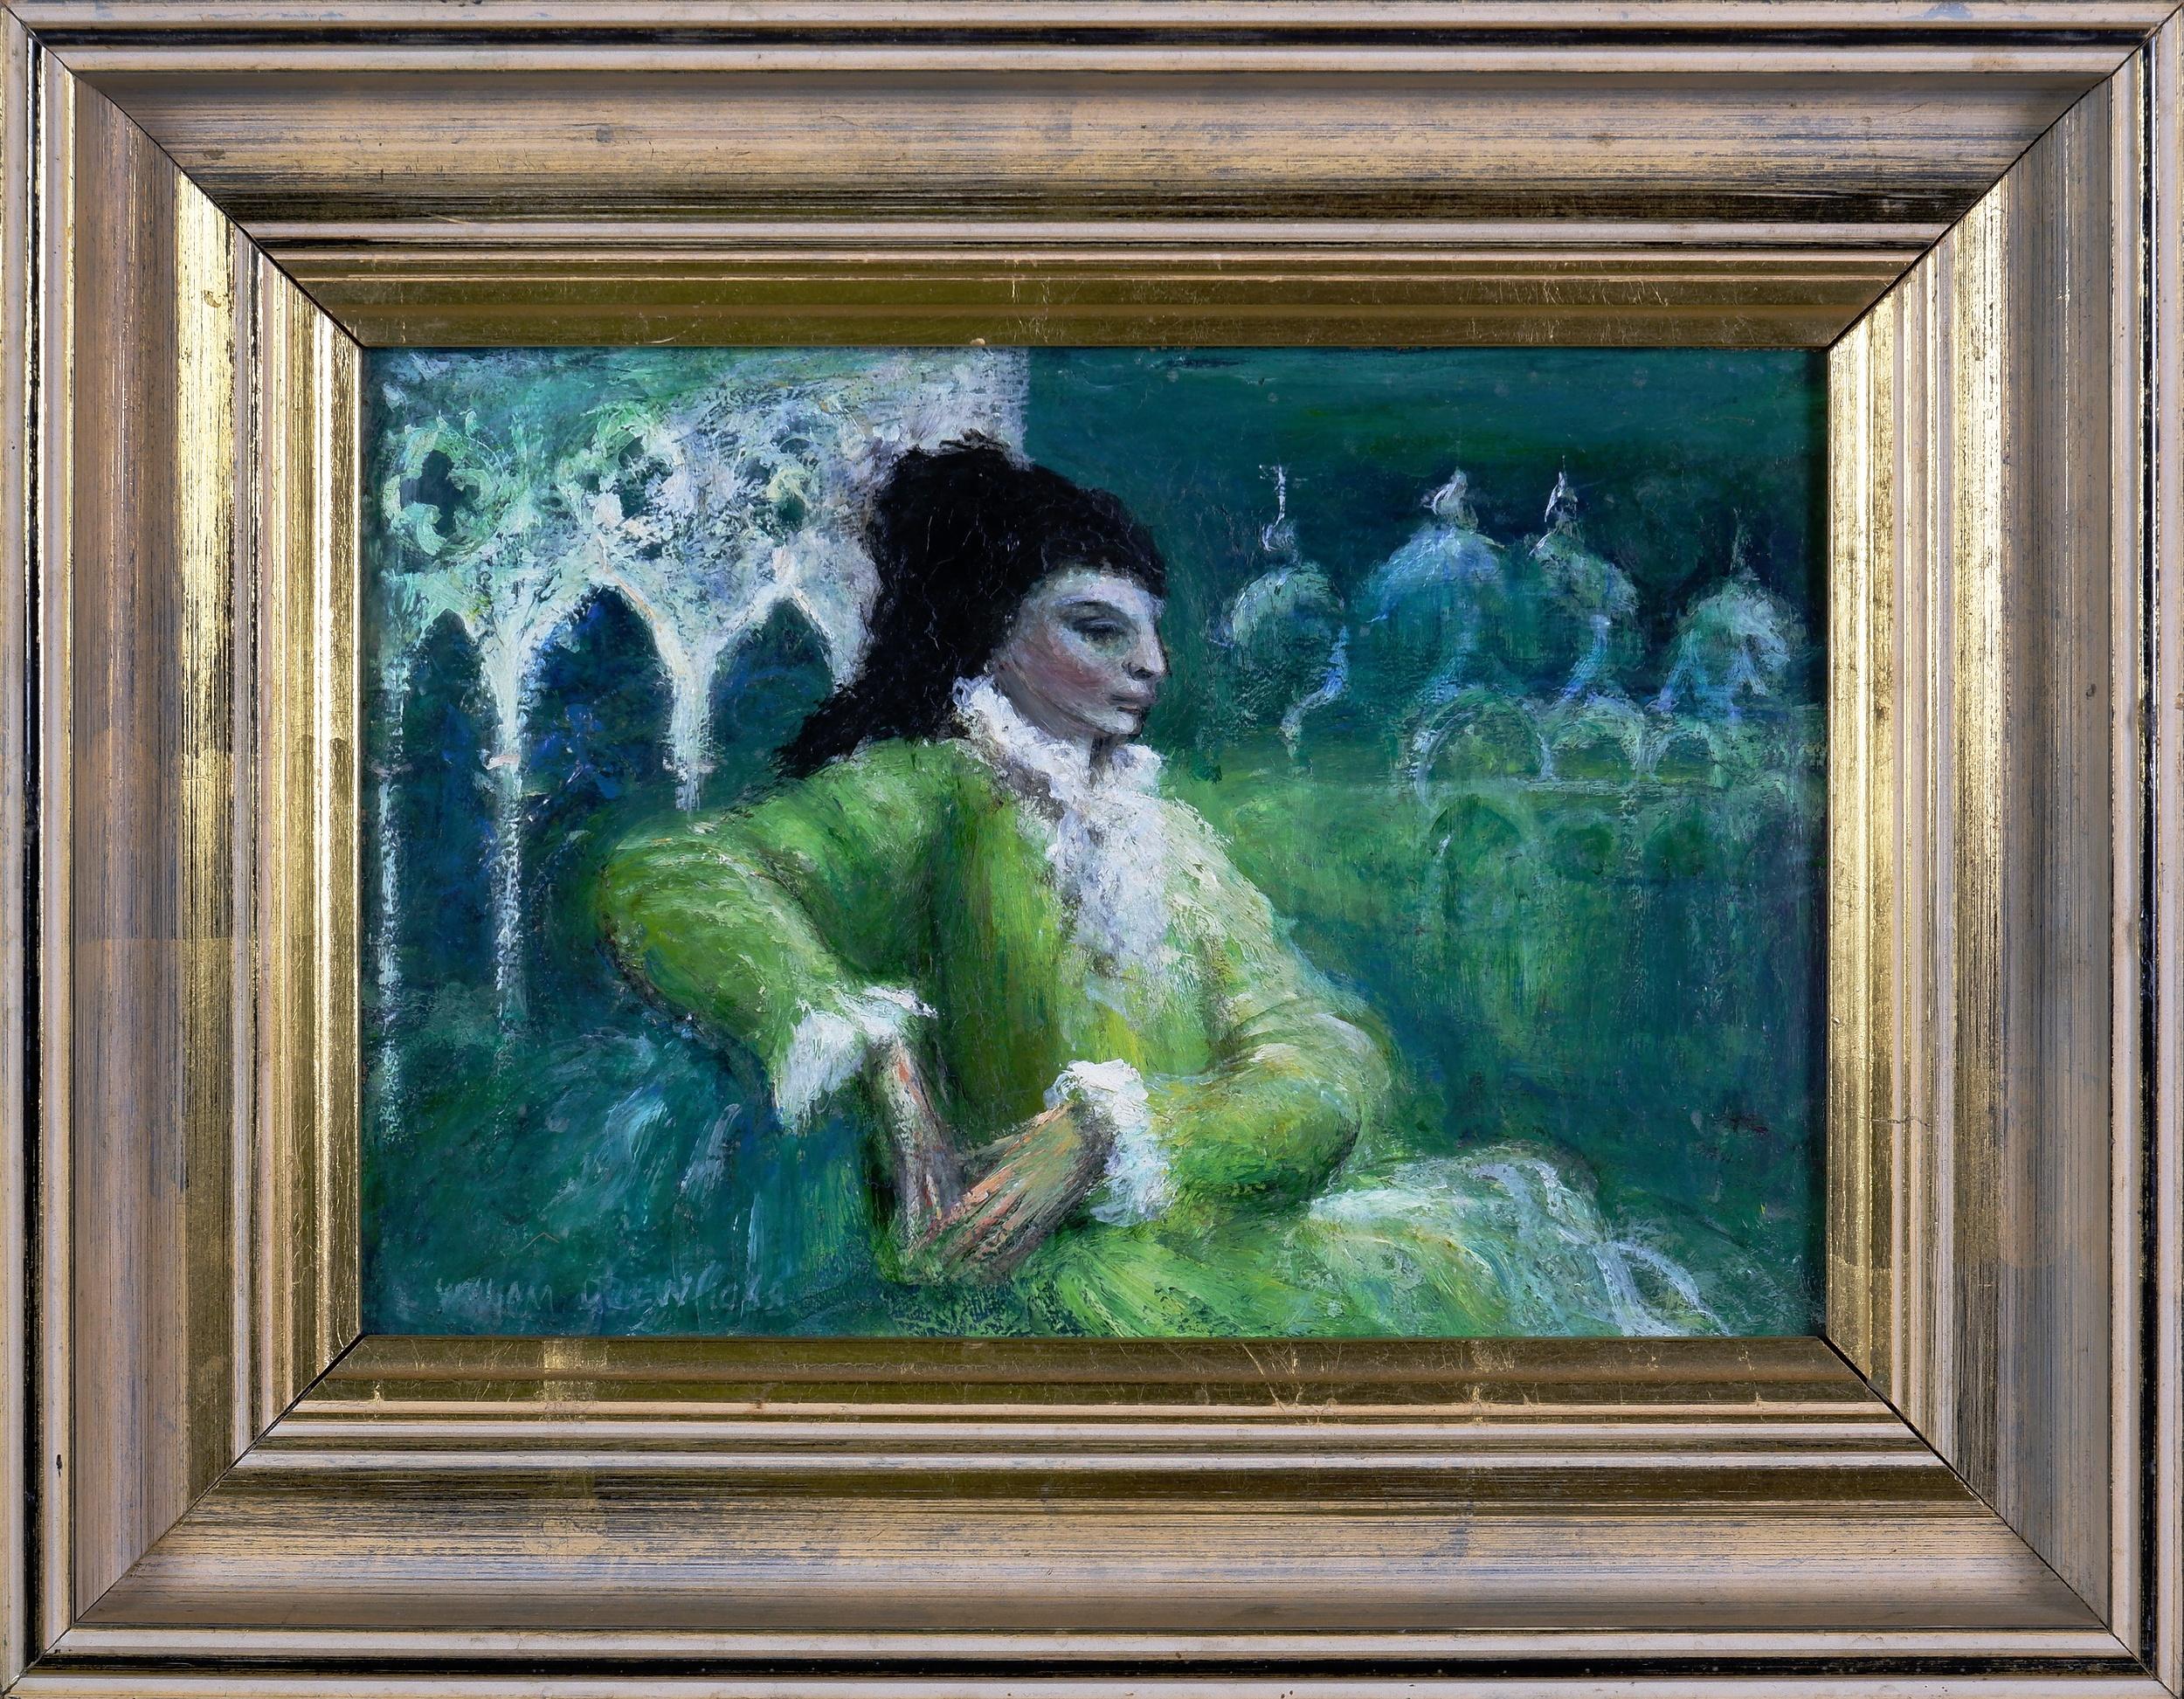 'William Drew (1928-1983), Venetian Lady 1968, Oil on Board, 16 x 23.5 cm'